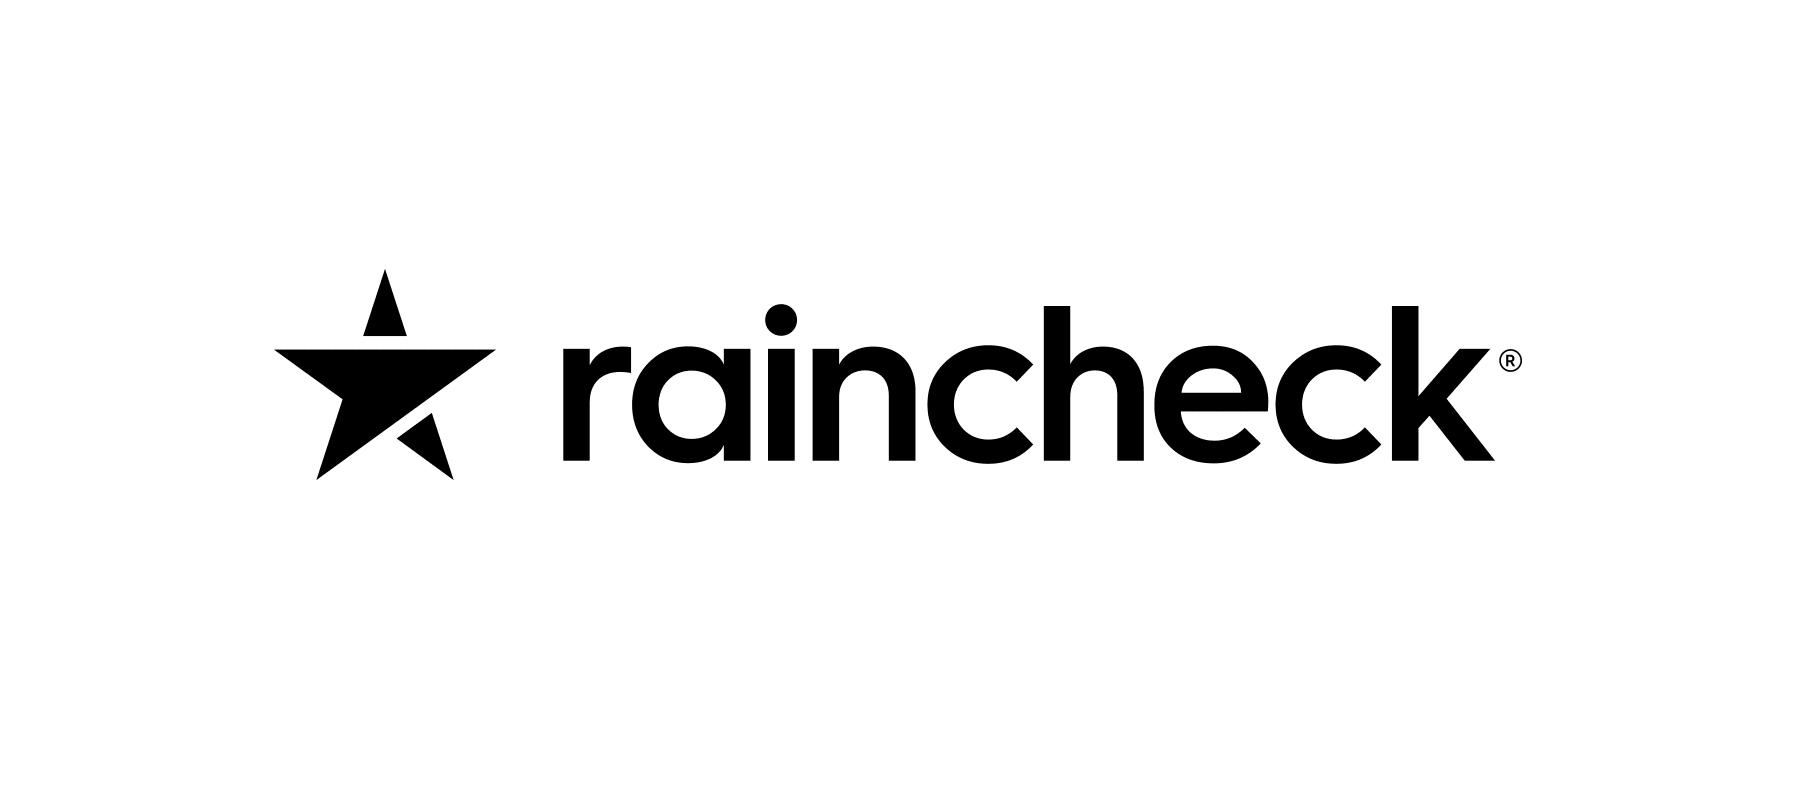 RC-brand-2.jpg